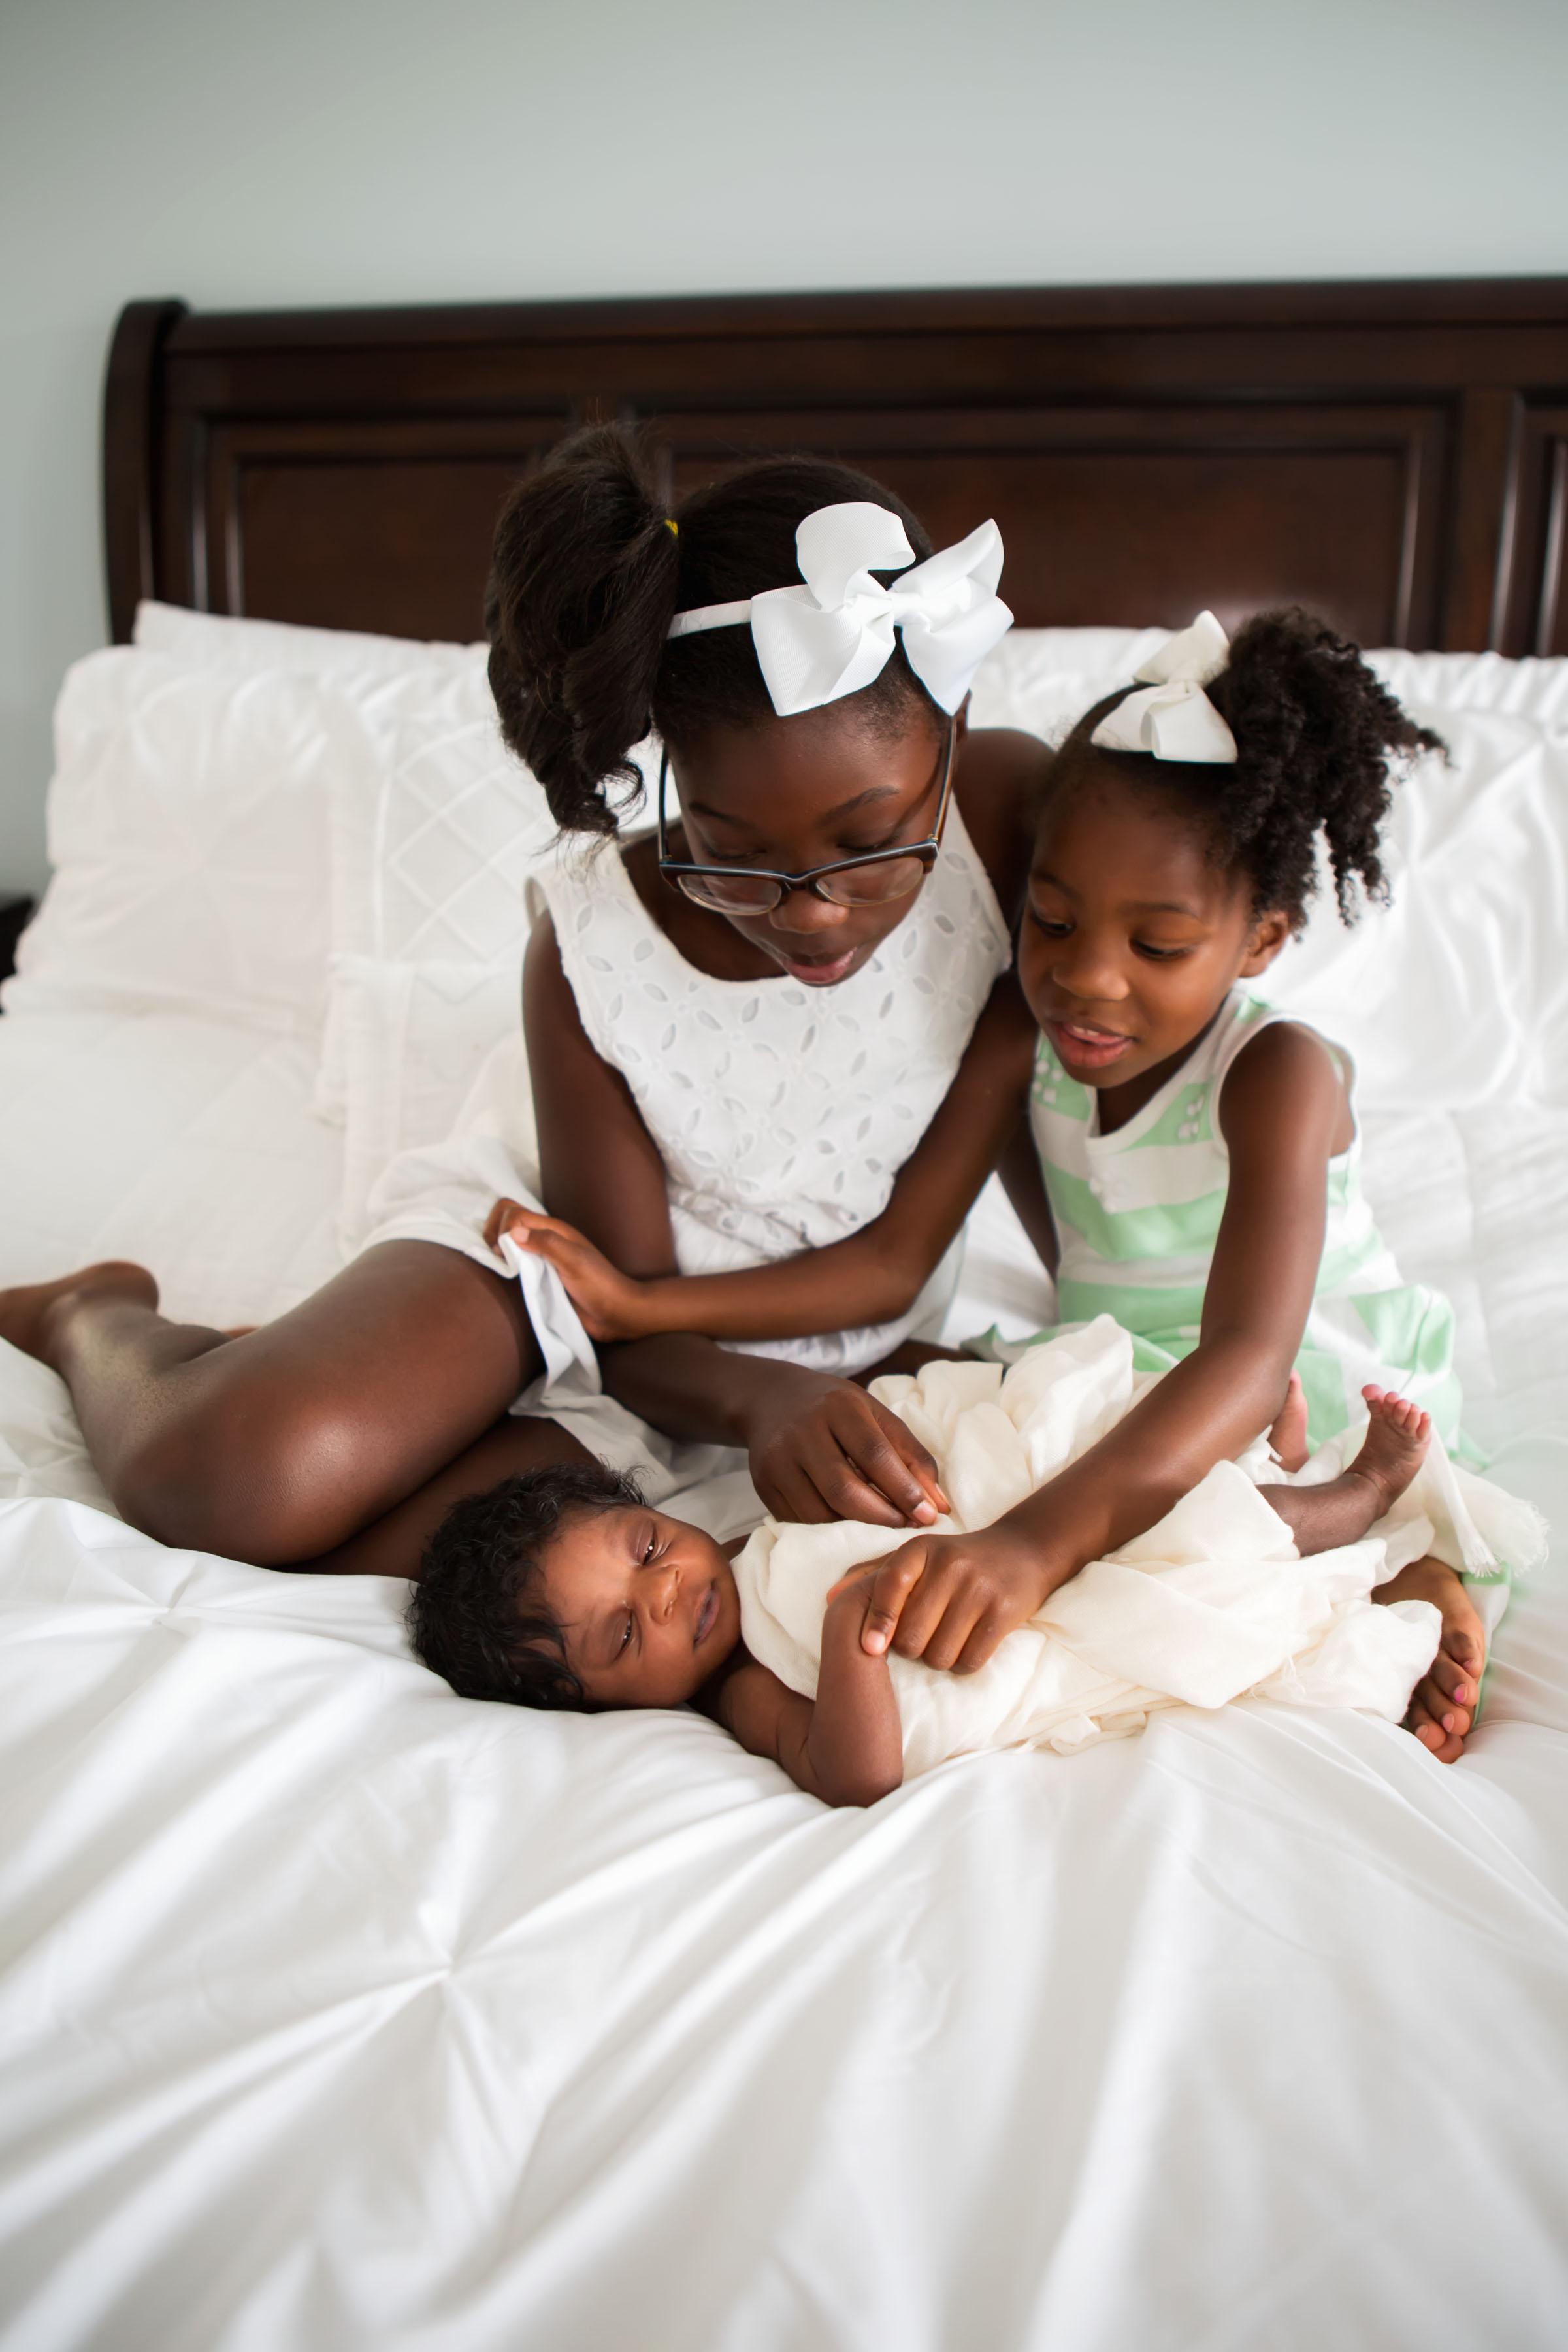 North-Carolina-Newborn-Photography-Tiffany-Abruzzo-Jordan-28.jpg